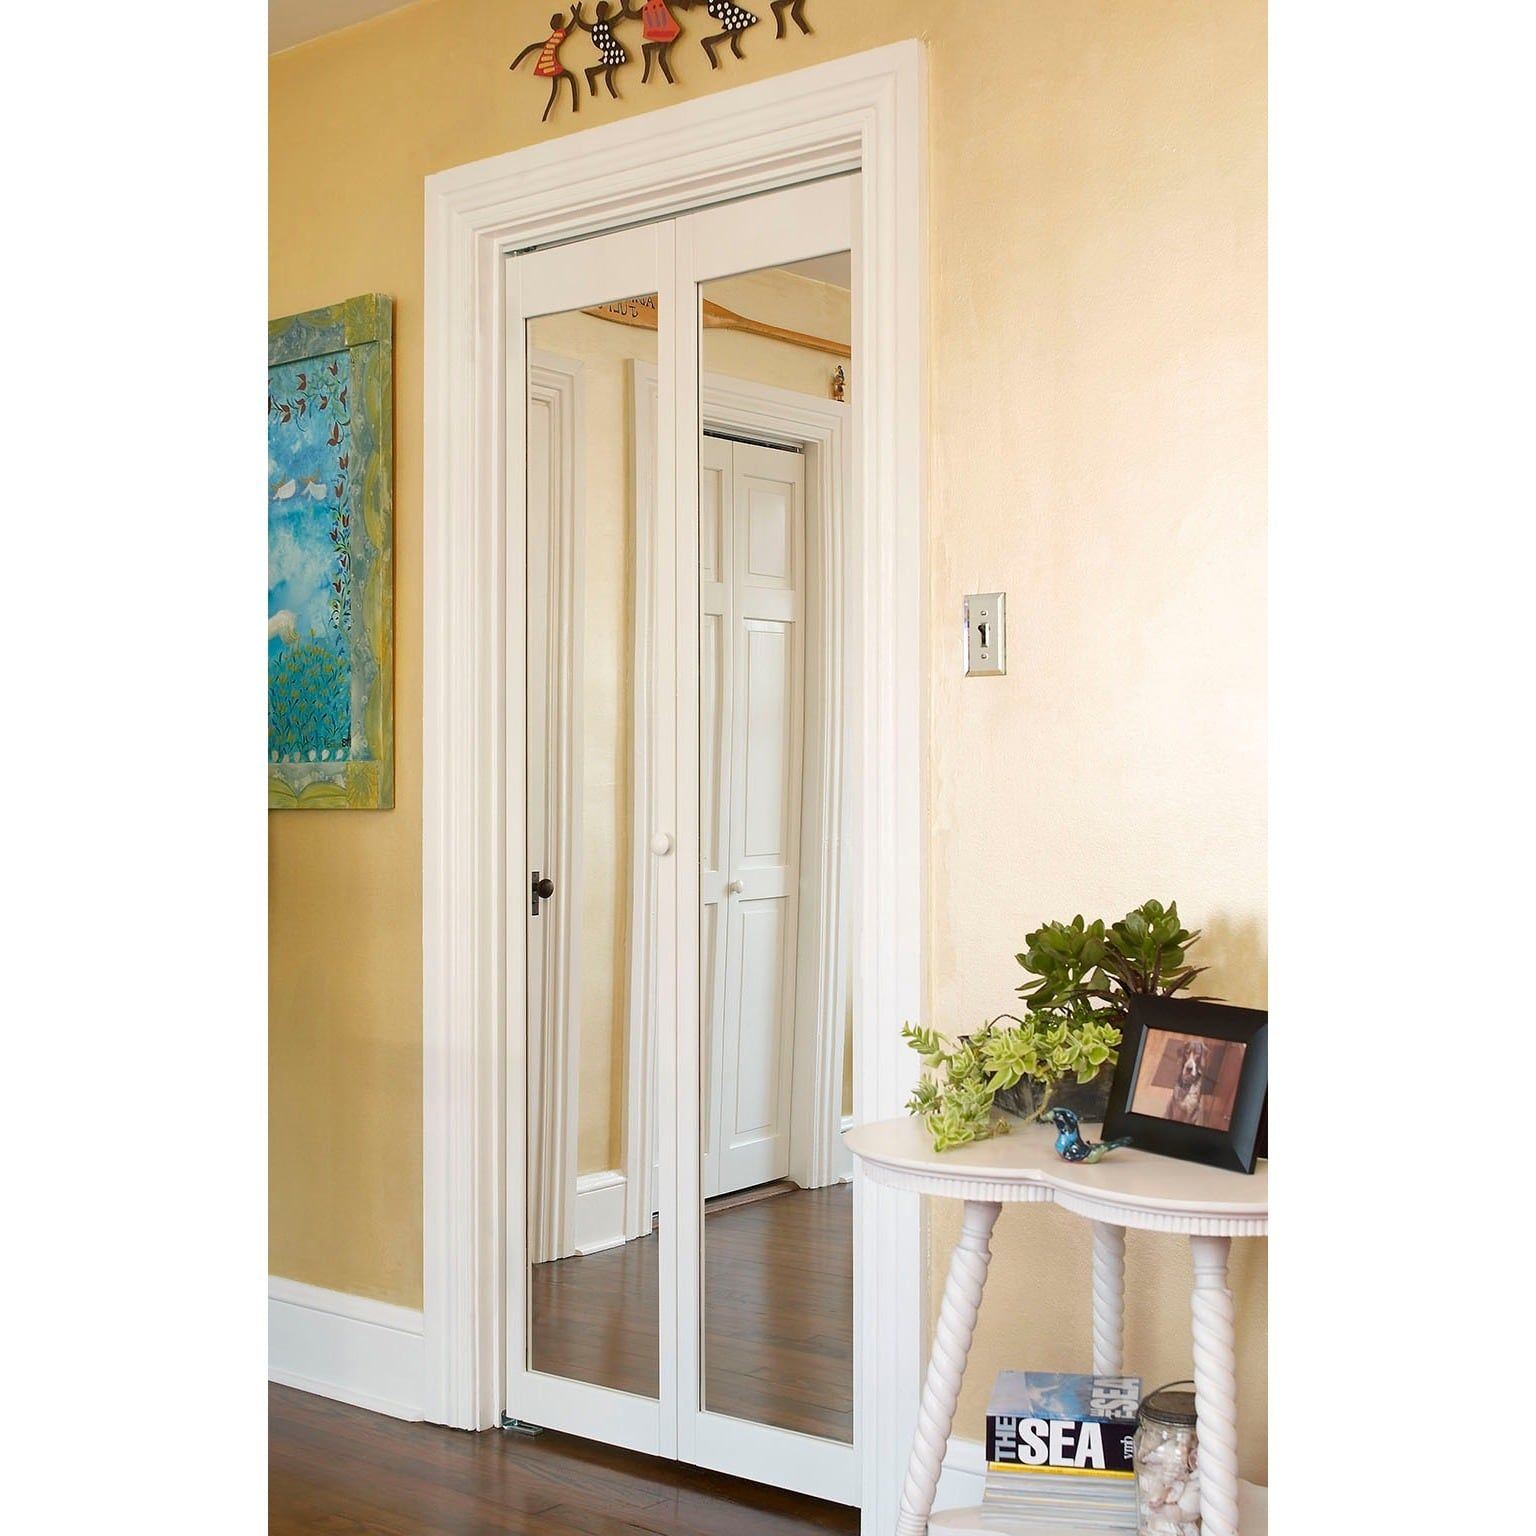 Online Shopping Bedding Furniture Electronics Jewelry Clothing More Bifold Doors Sliding Closet Doors Glass Bifold Doors